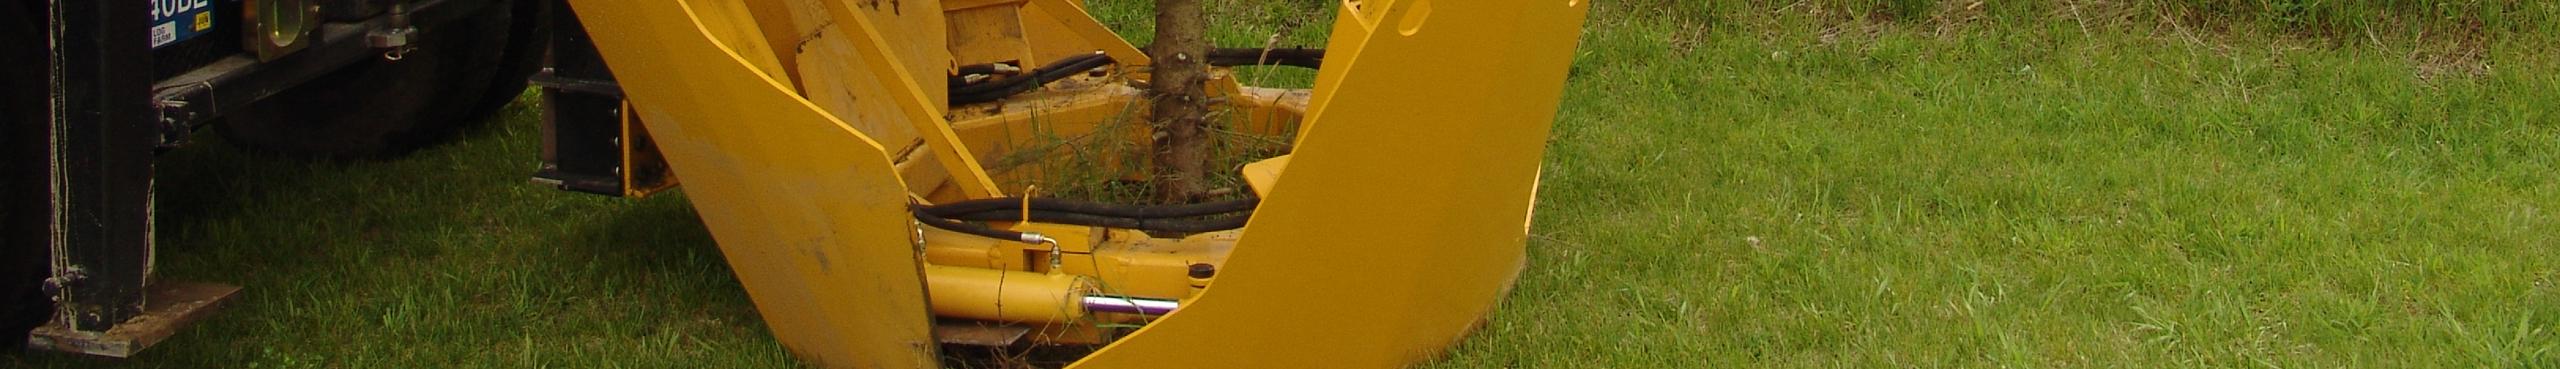 Dayton Bag & Burlap Nursery Tree Spade